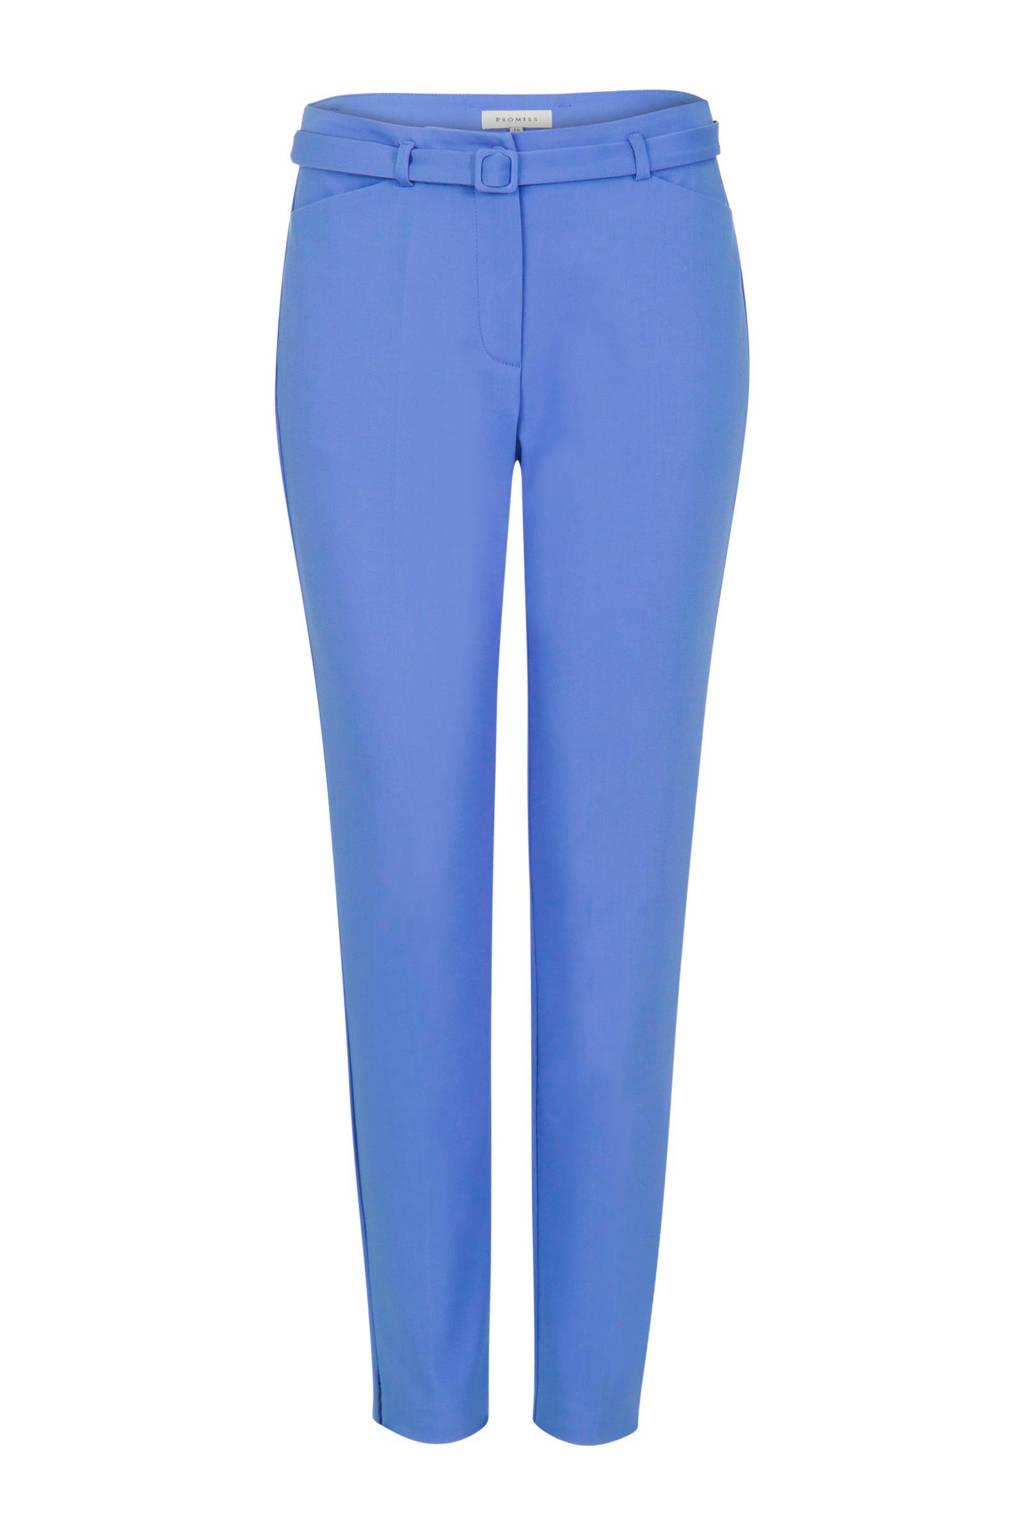 Promiss pantalon met riem blauw, Blauw